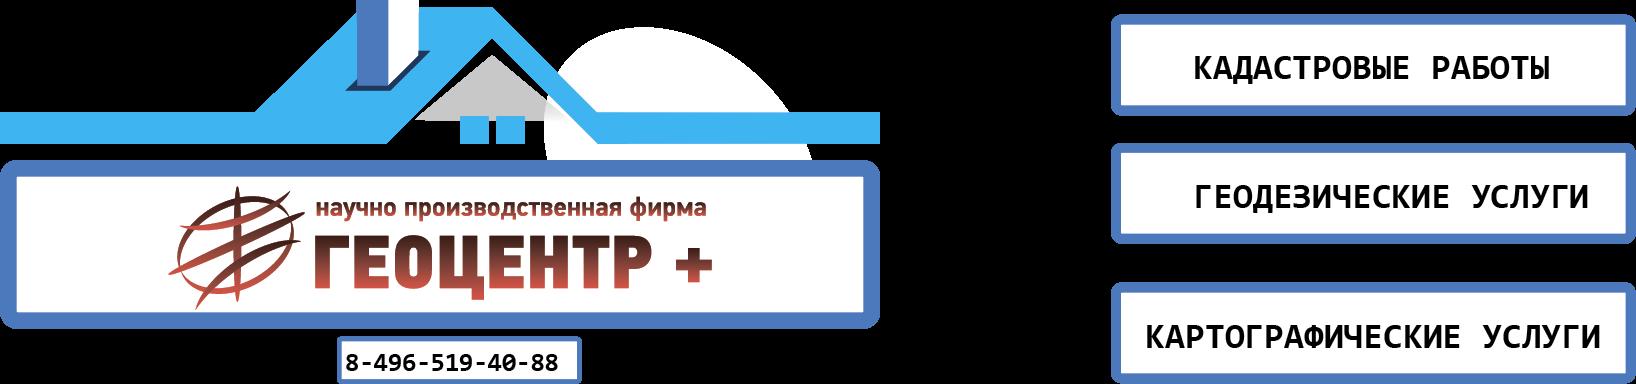 "ООО ""НПФ ""Геоцентр+"""